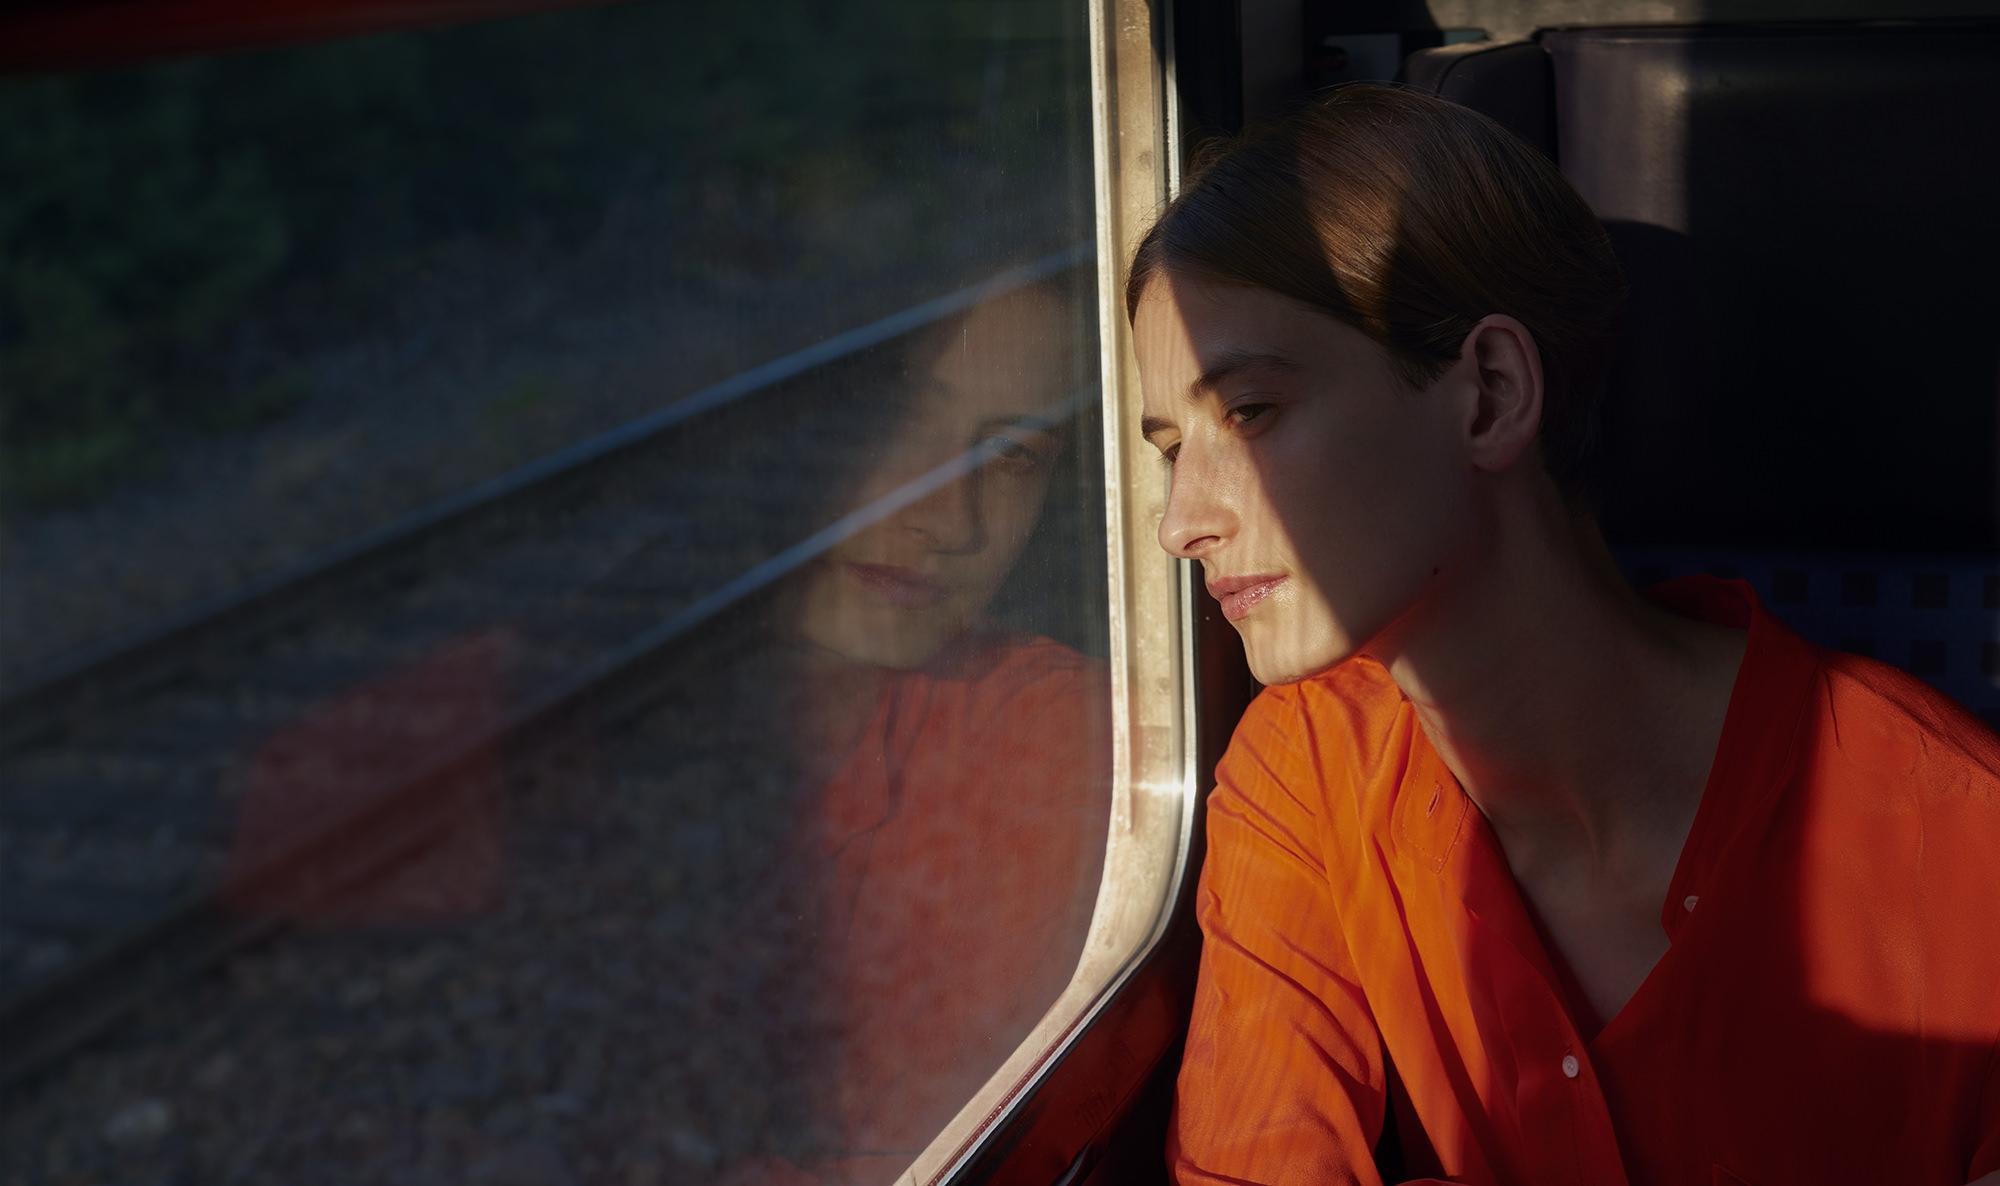 sonjamueller_lifestyle-portrait_train__000764 1